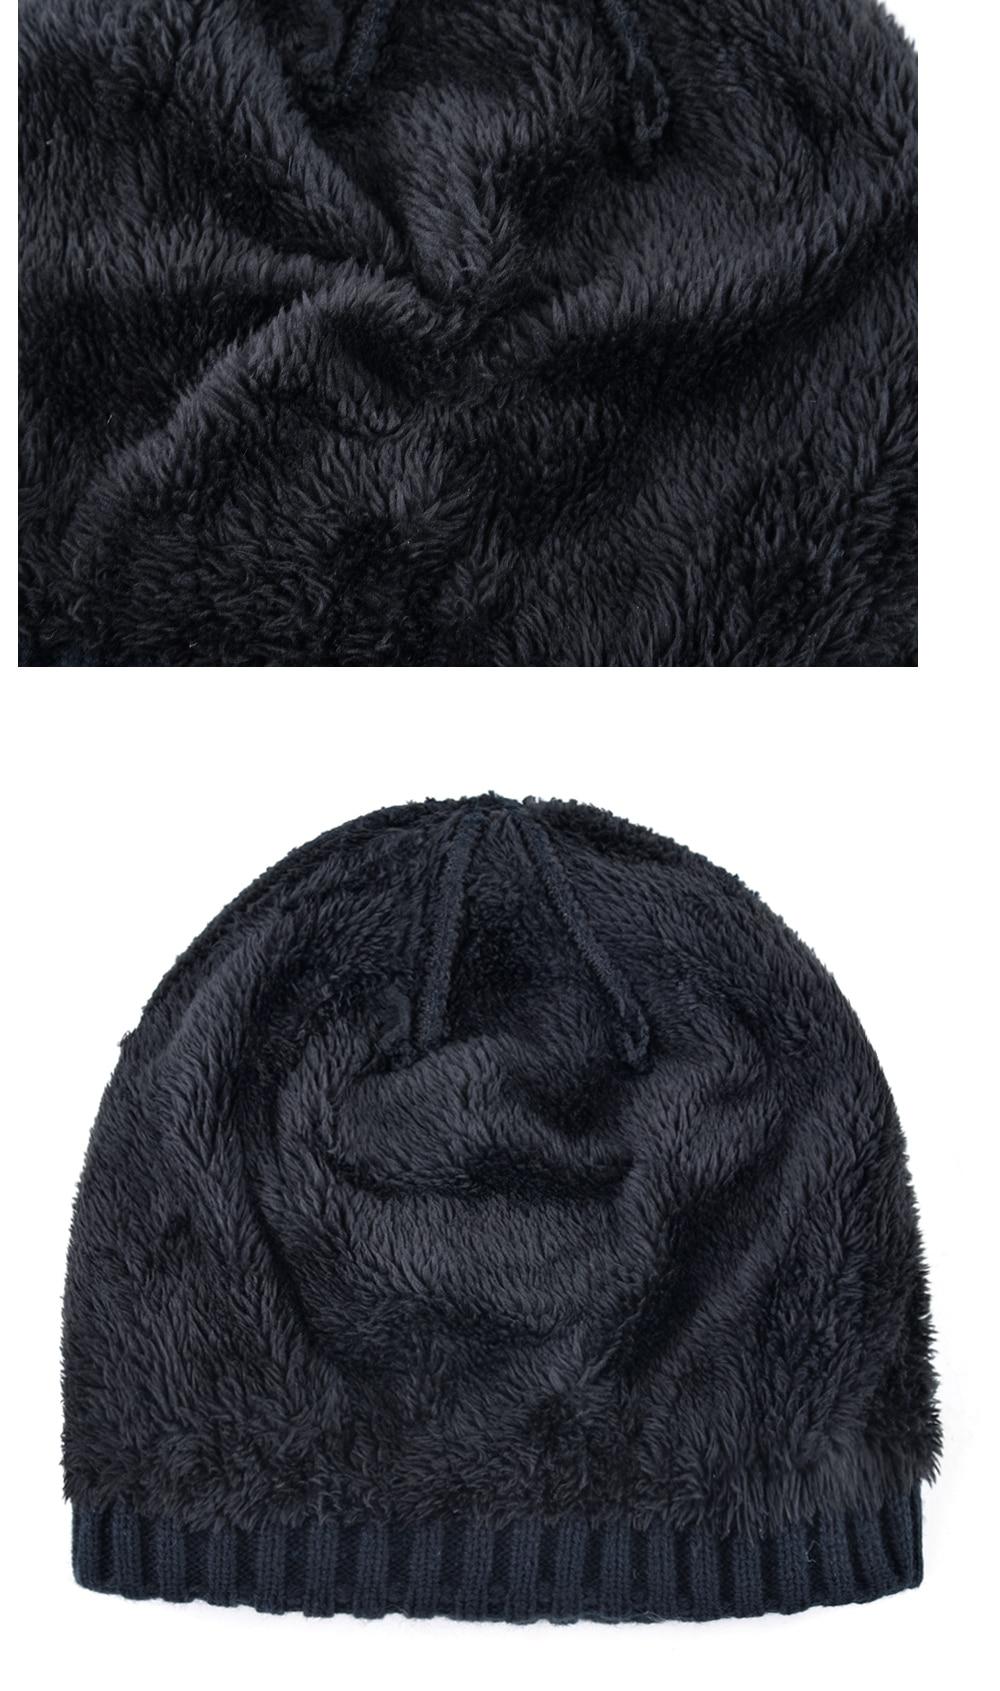 Super cool Skull patrón sombreros para hombres Punto de lana ...